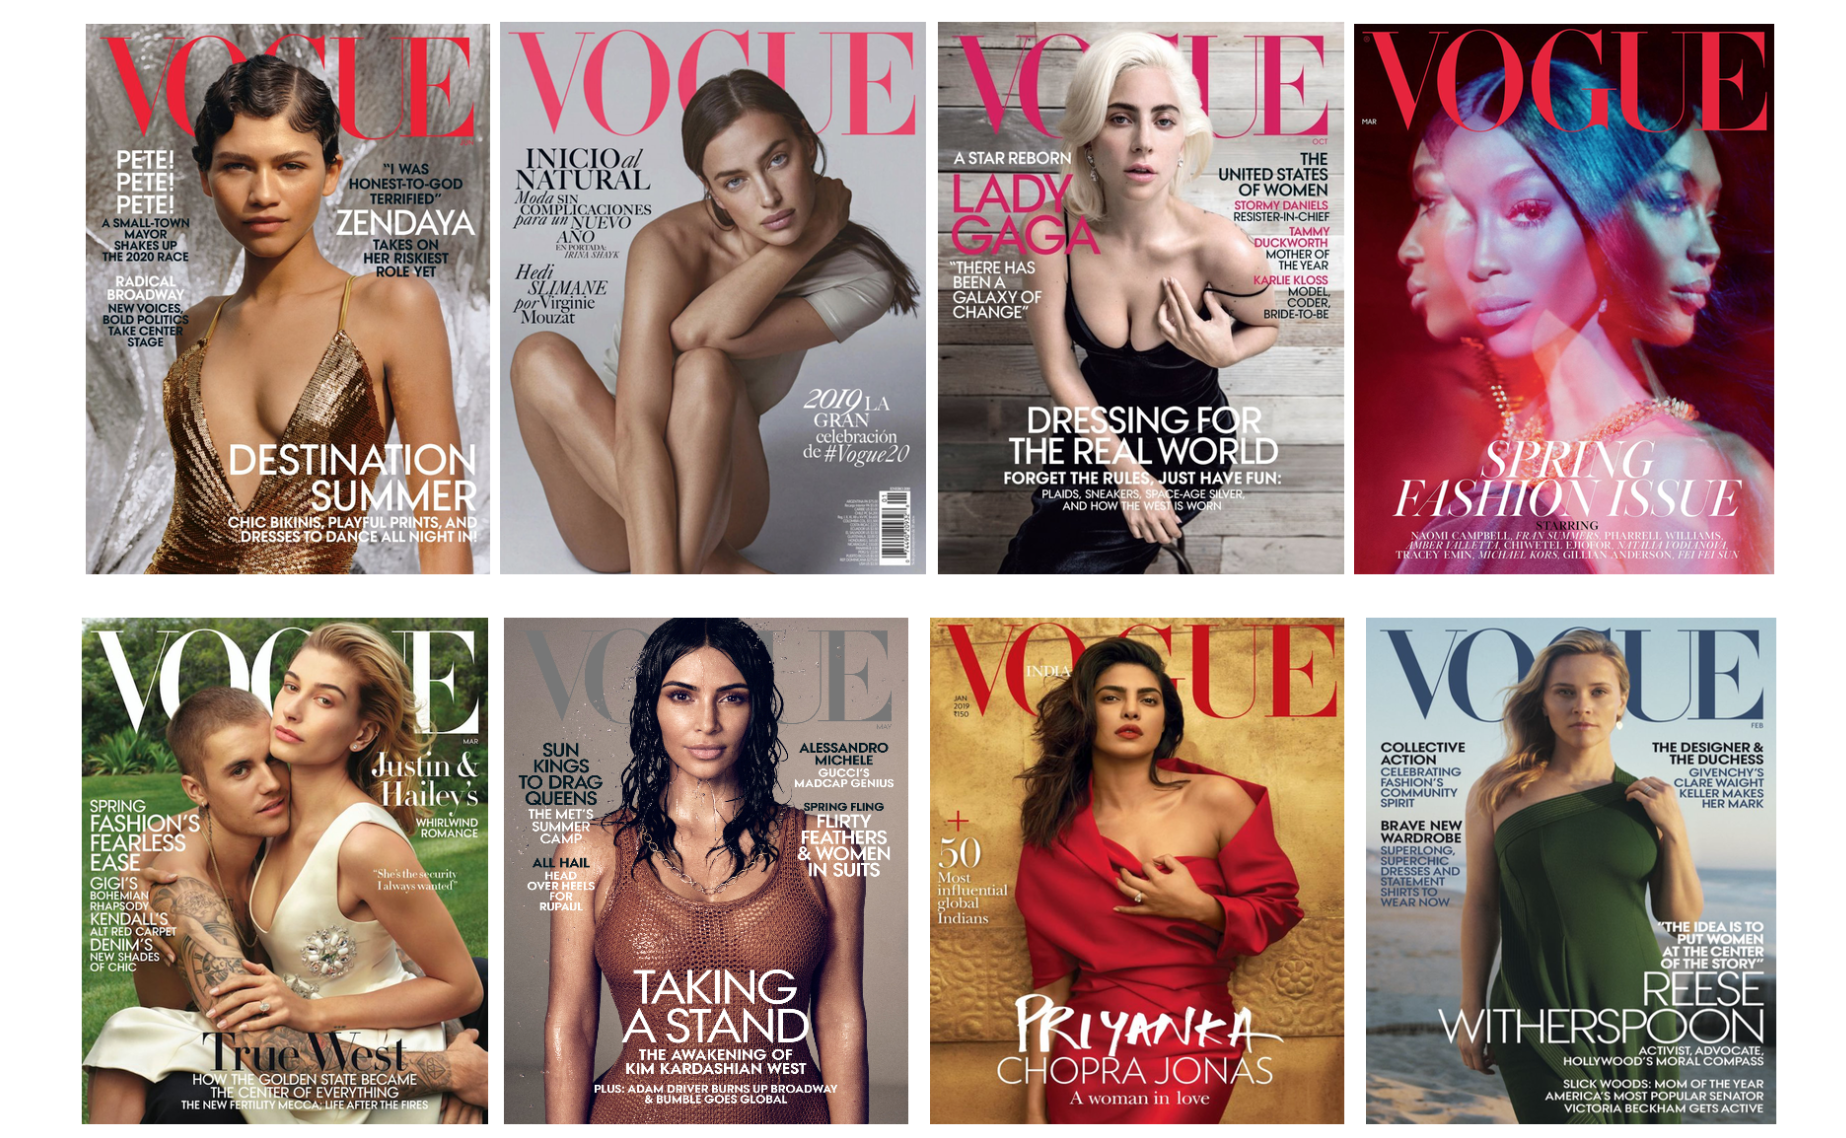 images via Vogue